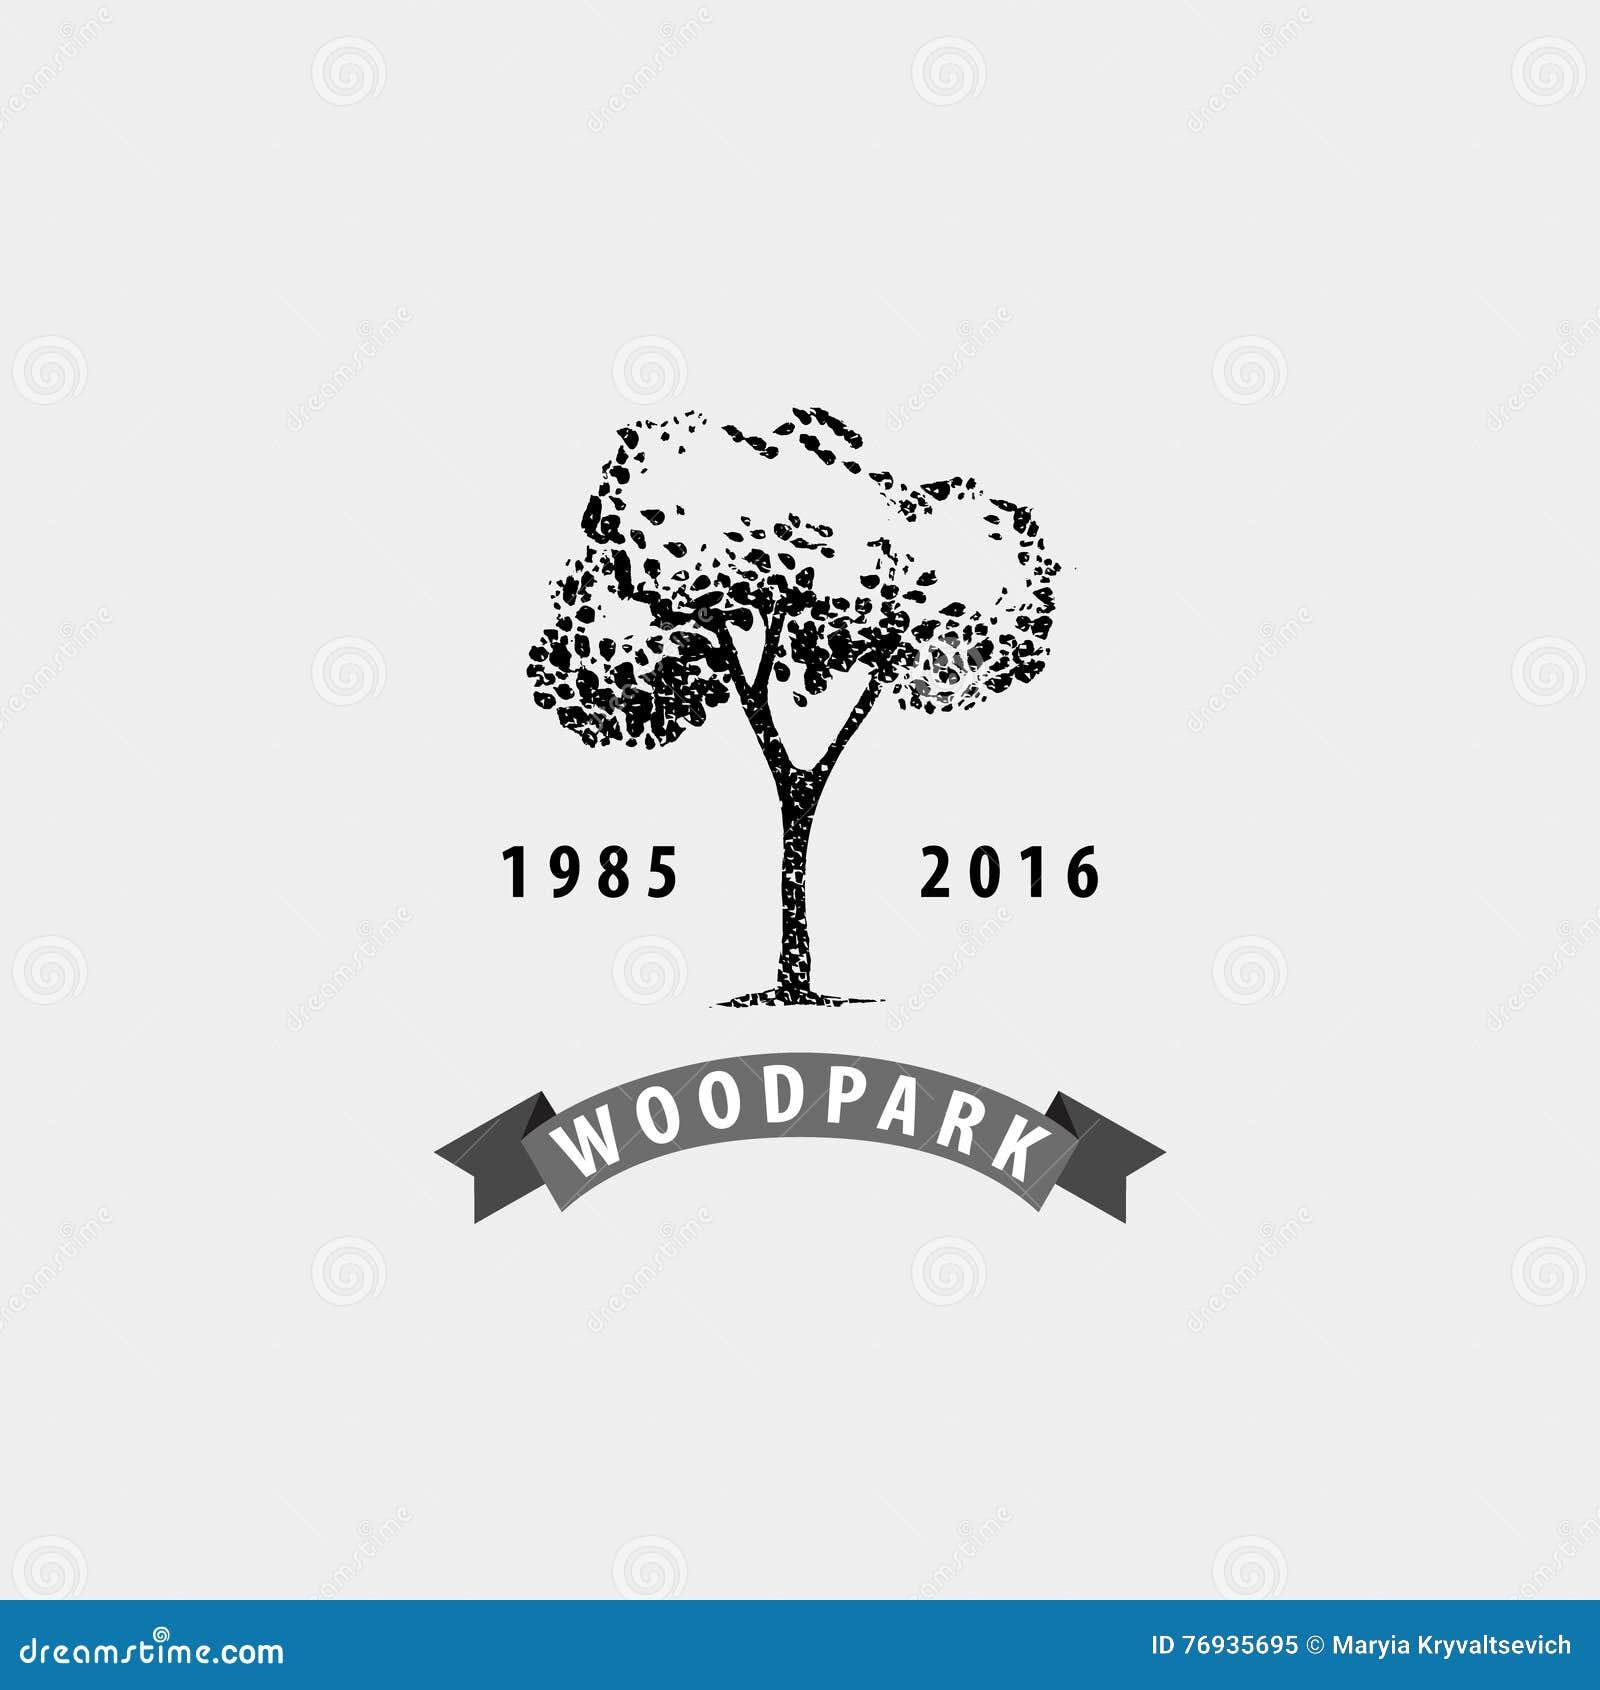 Vector Vintage Tree Logo Eco Print Hipster Emblem Stock Vector Illustration Of Healthy Label 76935695